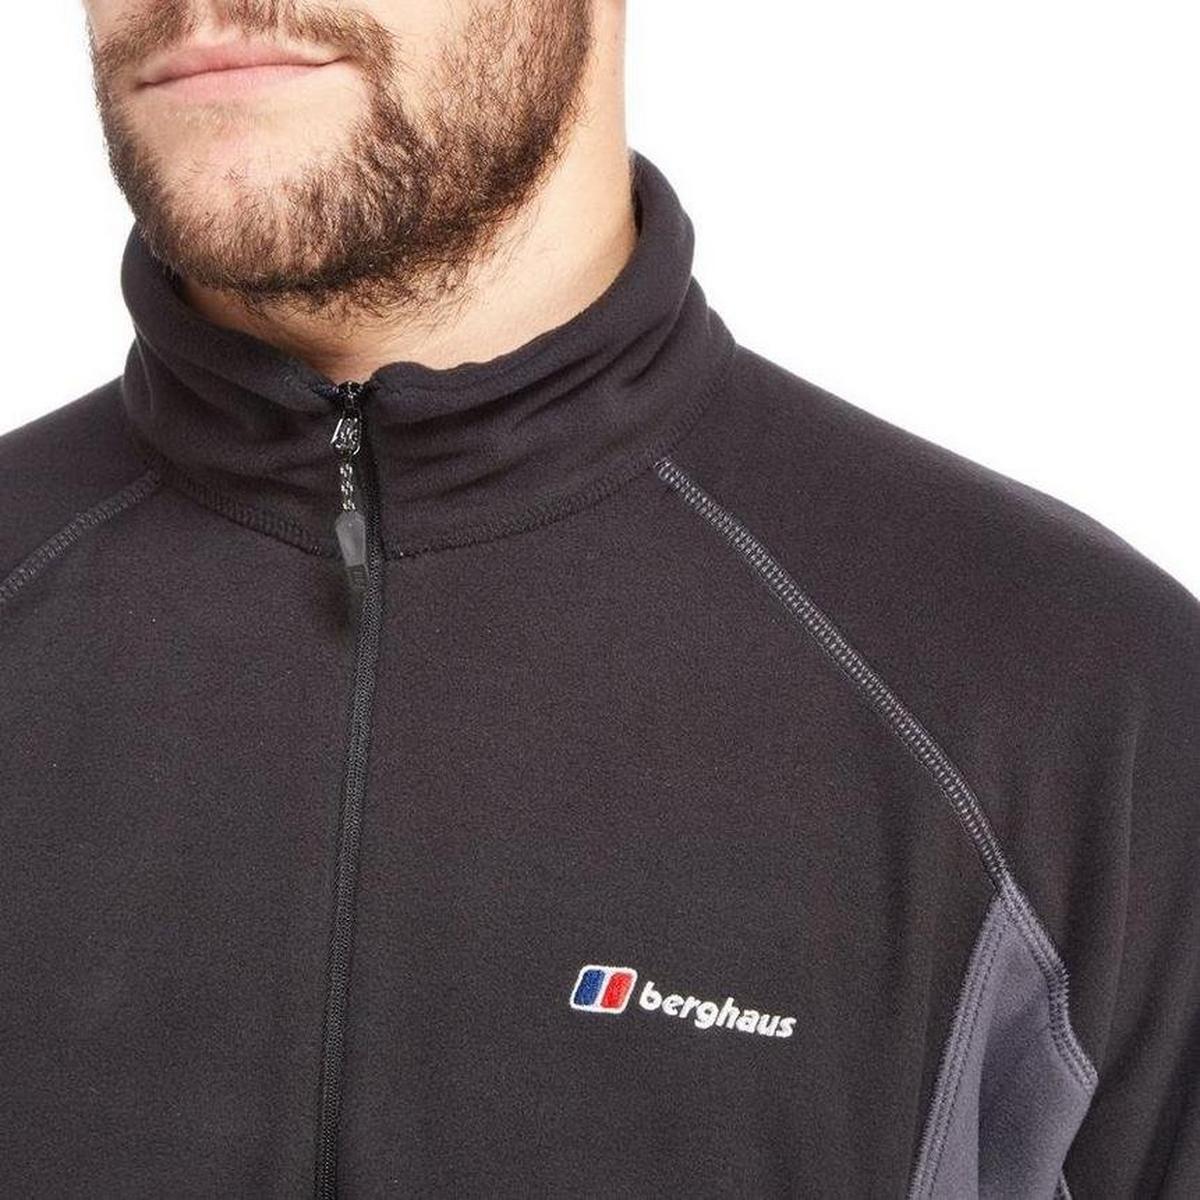 Berghaus Men's Berghaus Hartsop Half-Zip Fleece - Black Carbon